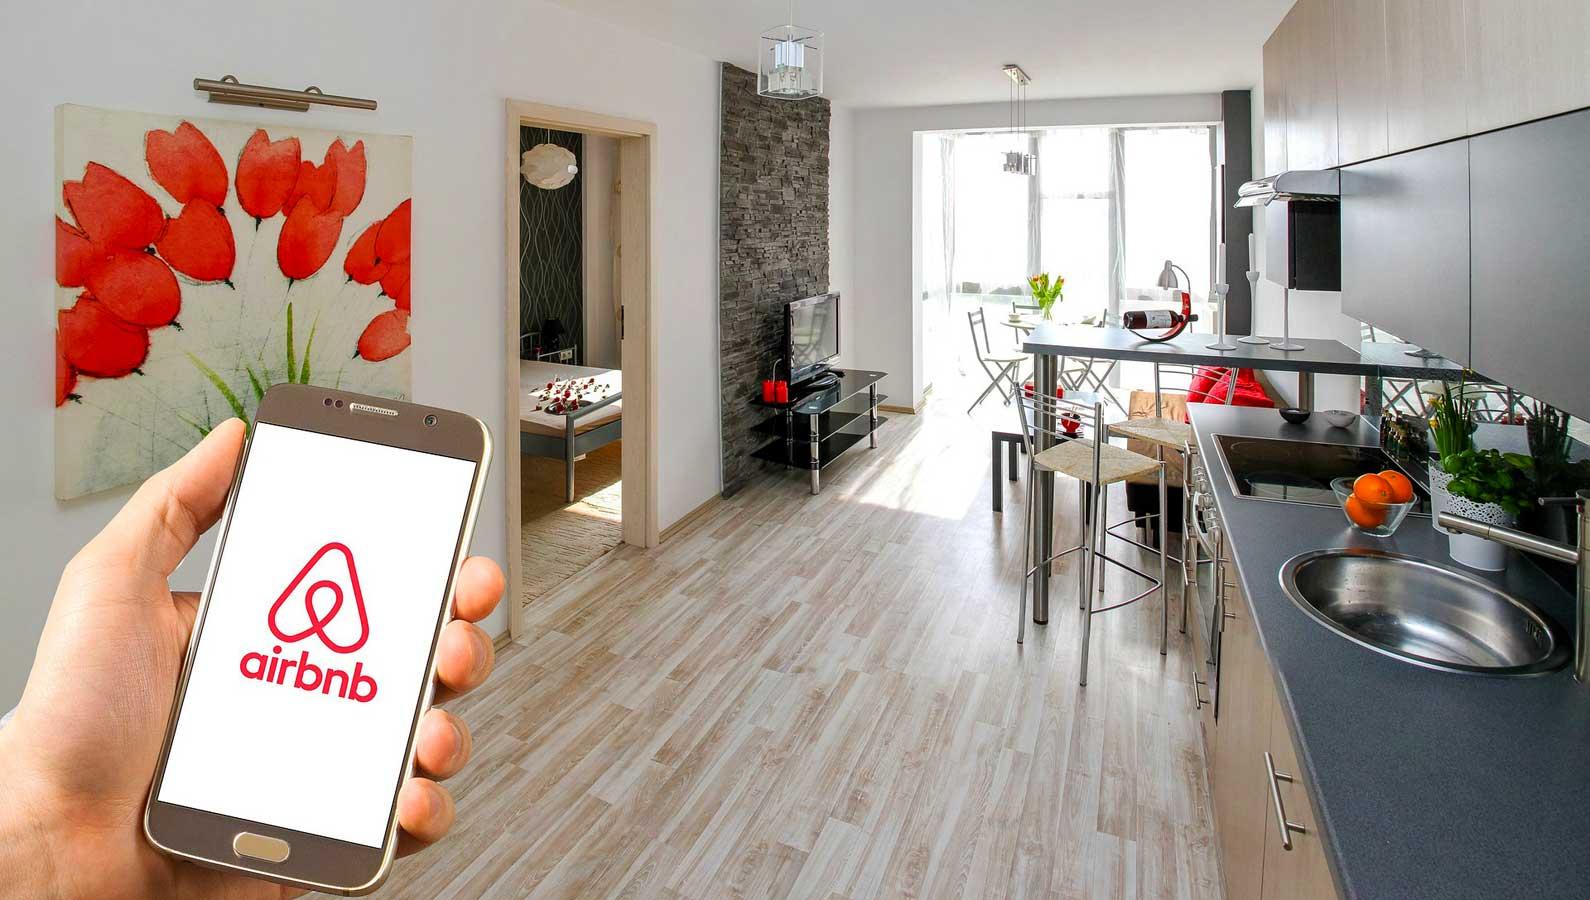 airbnb la gi vi sao nen ban phong tren airbnb 2835 - airbnb-la-gi-vi-sao-nen-ban-phong-tren-airbnb-2835